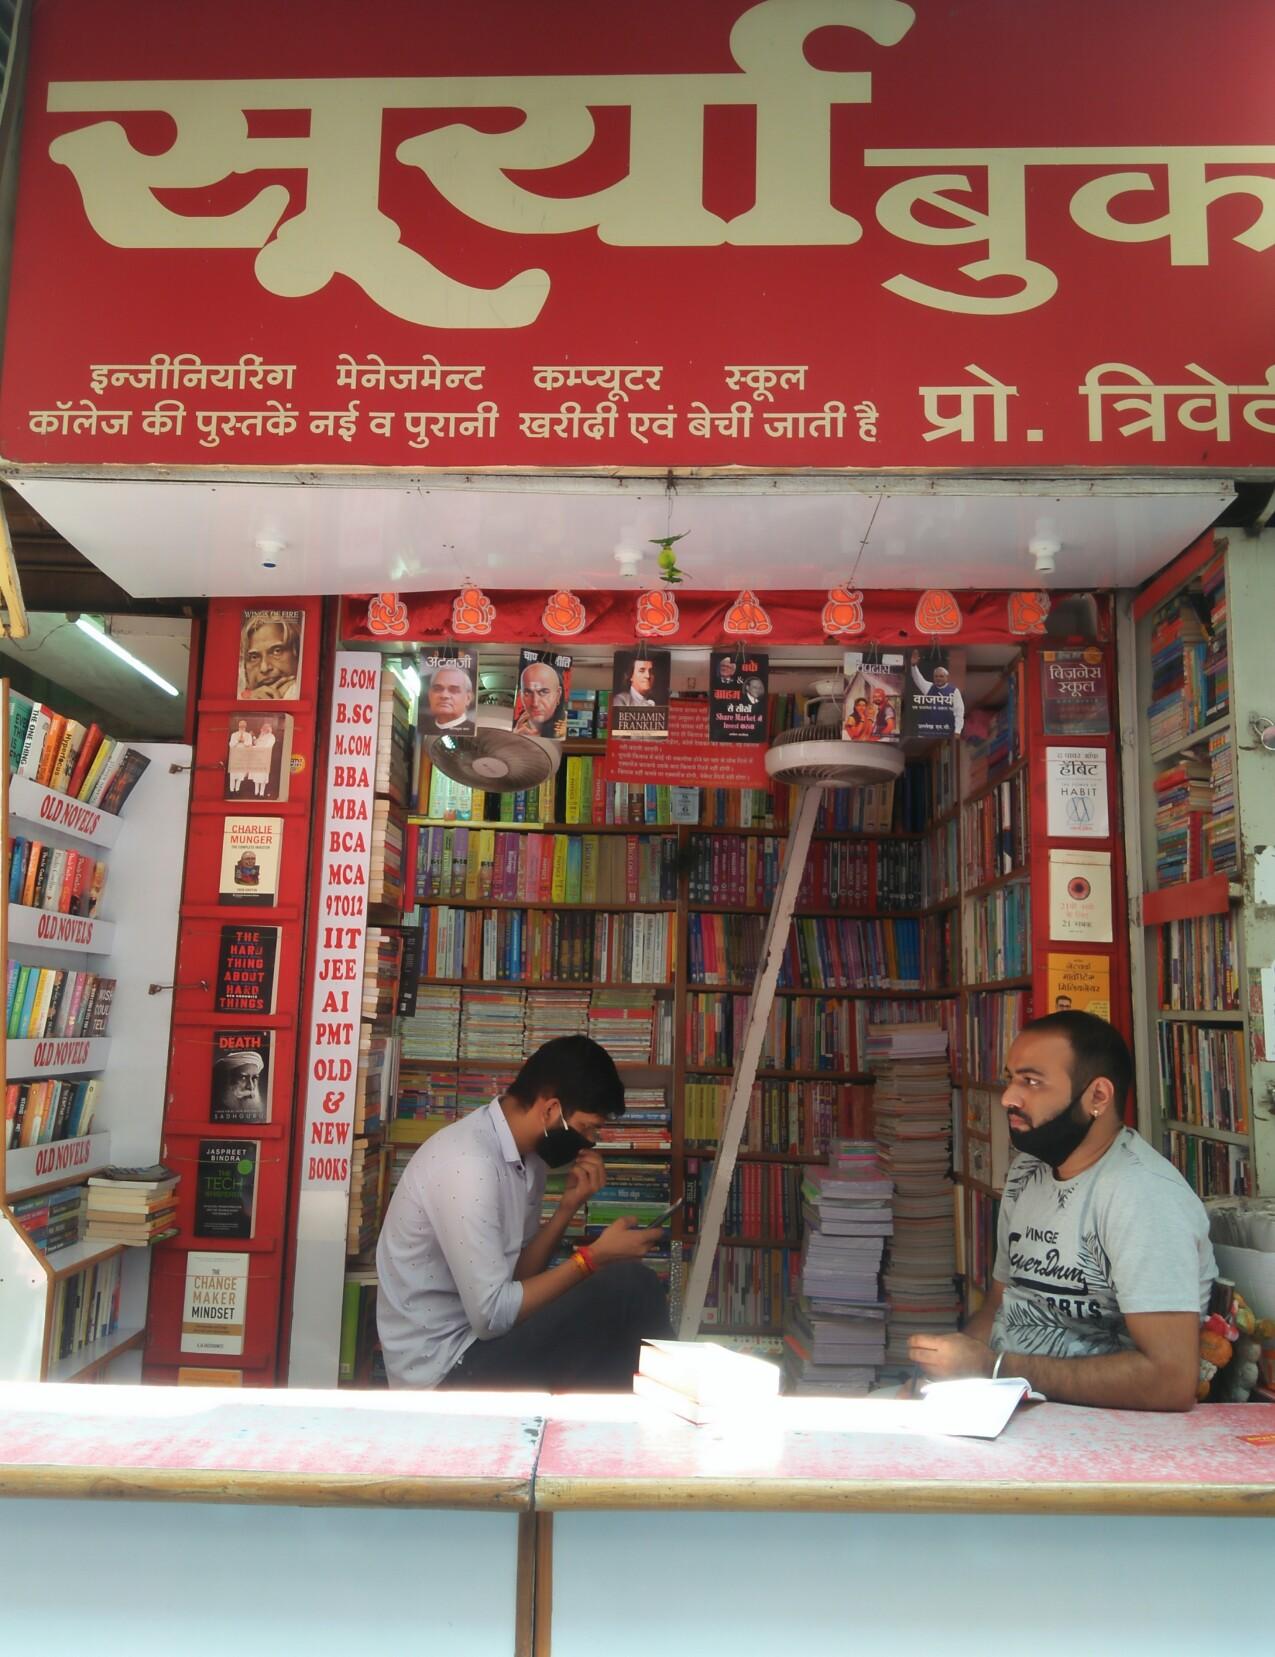 Surya book